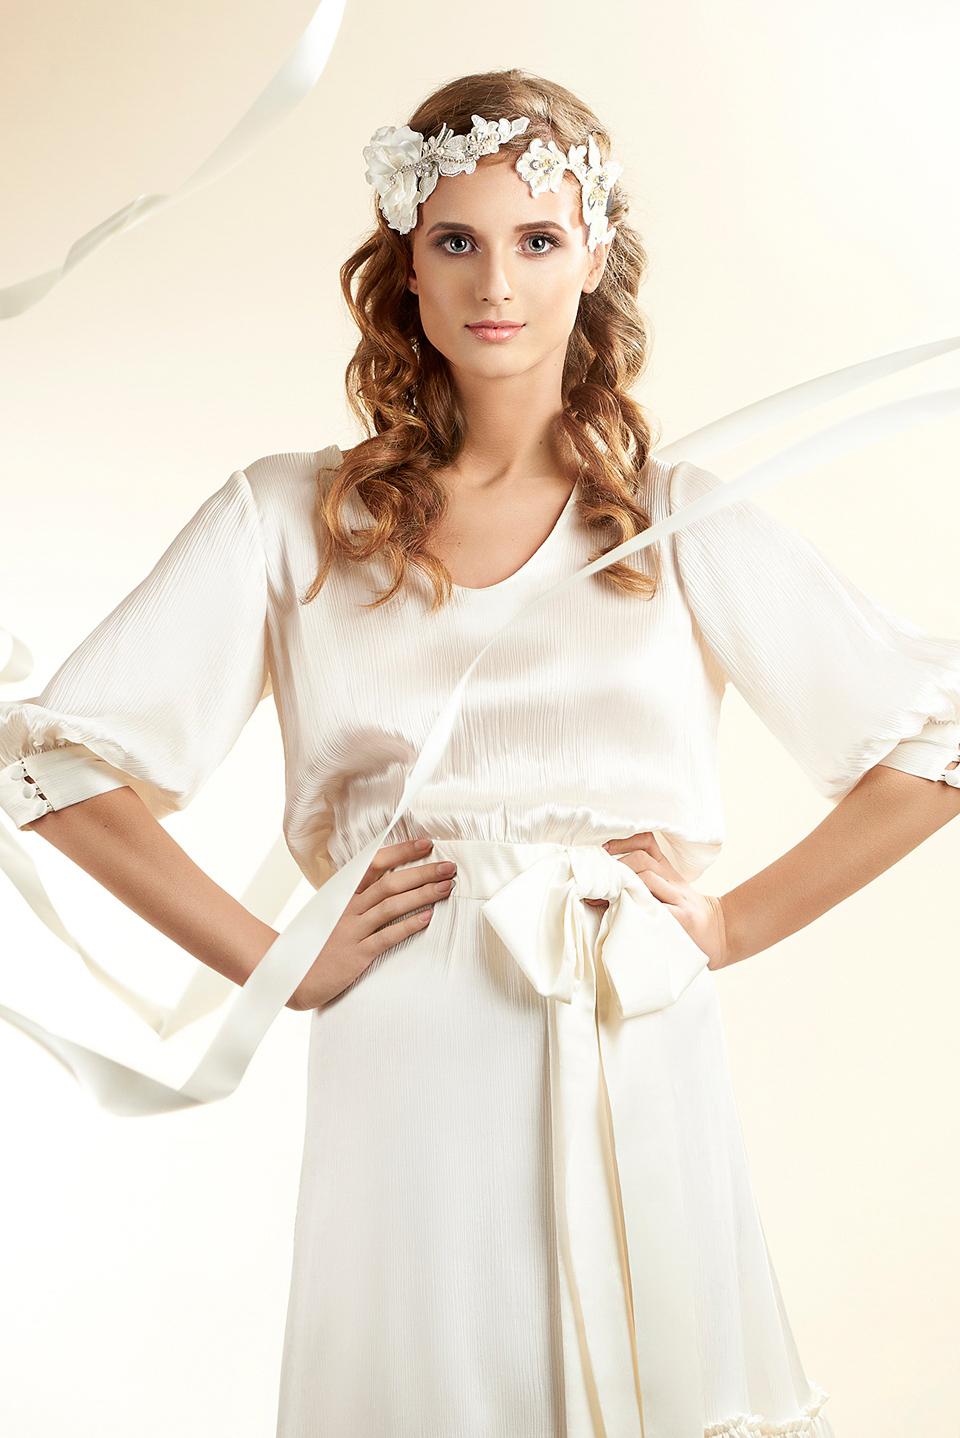 Florentés - Delicately Handmade Floral Wedding Accessories (Bridal Fashion Fashion & Beauty )